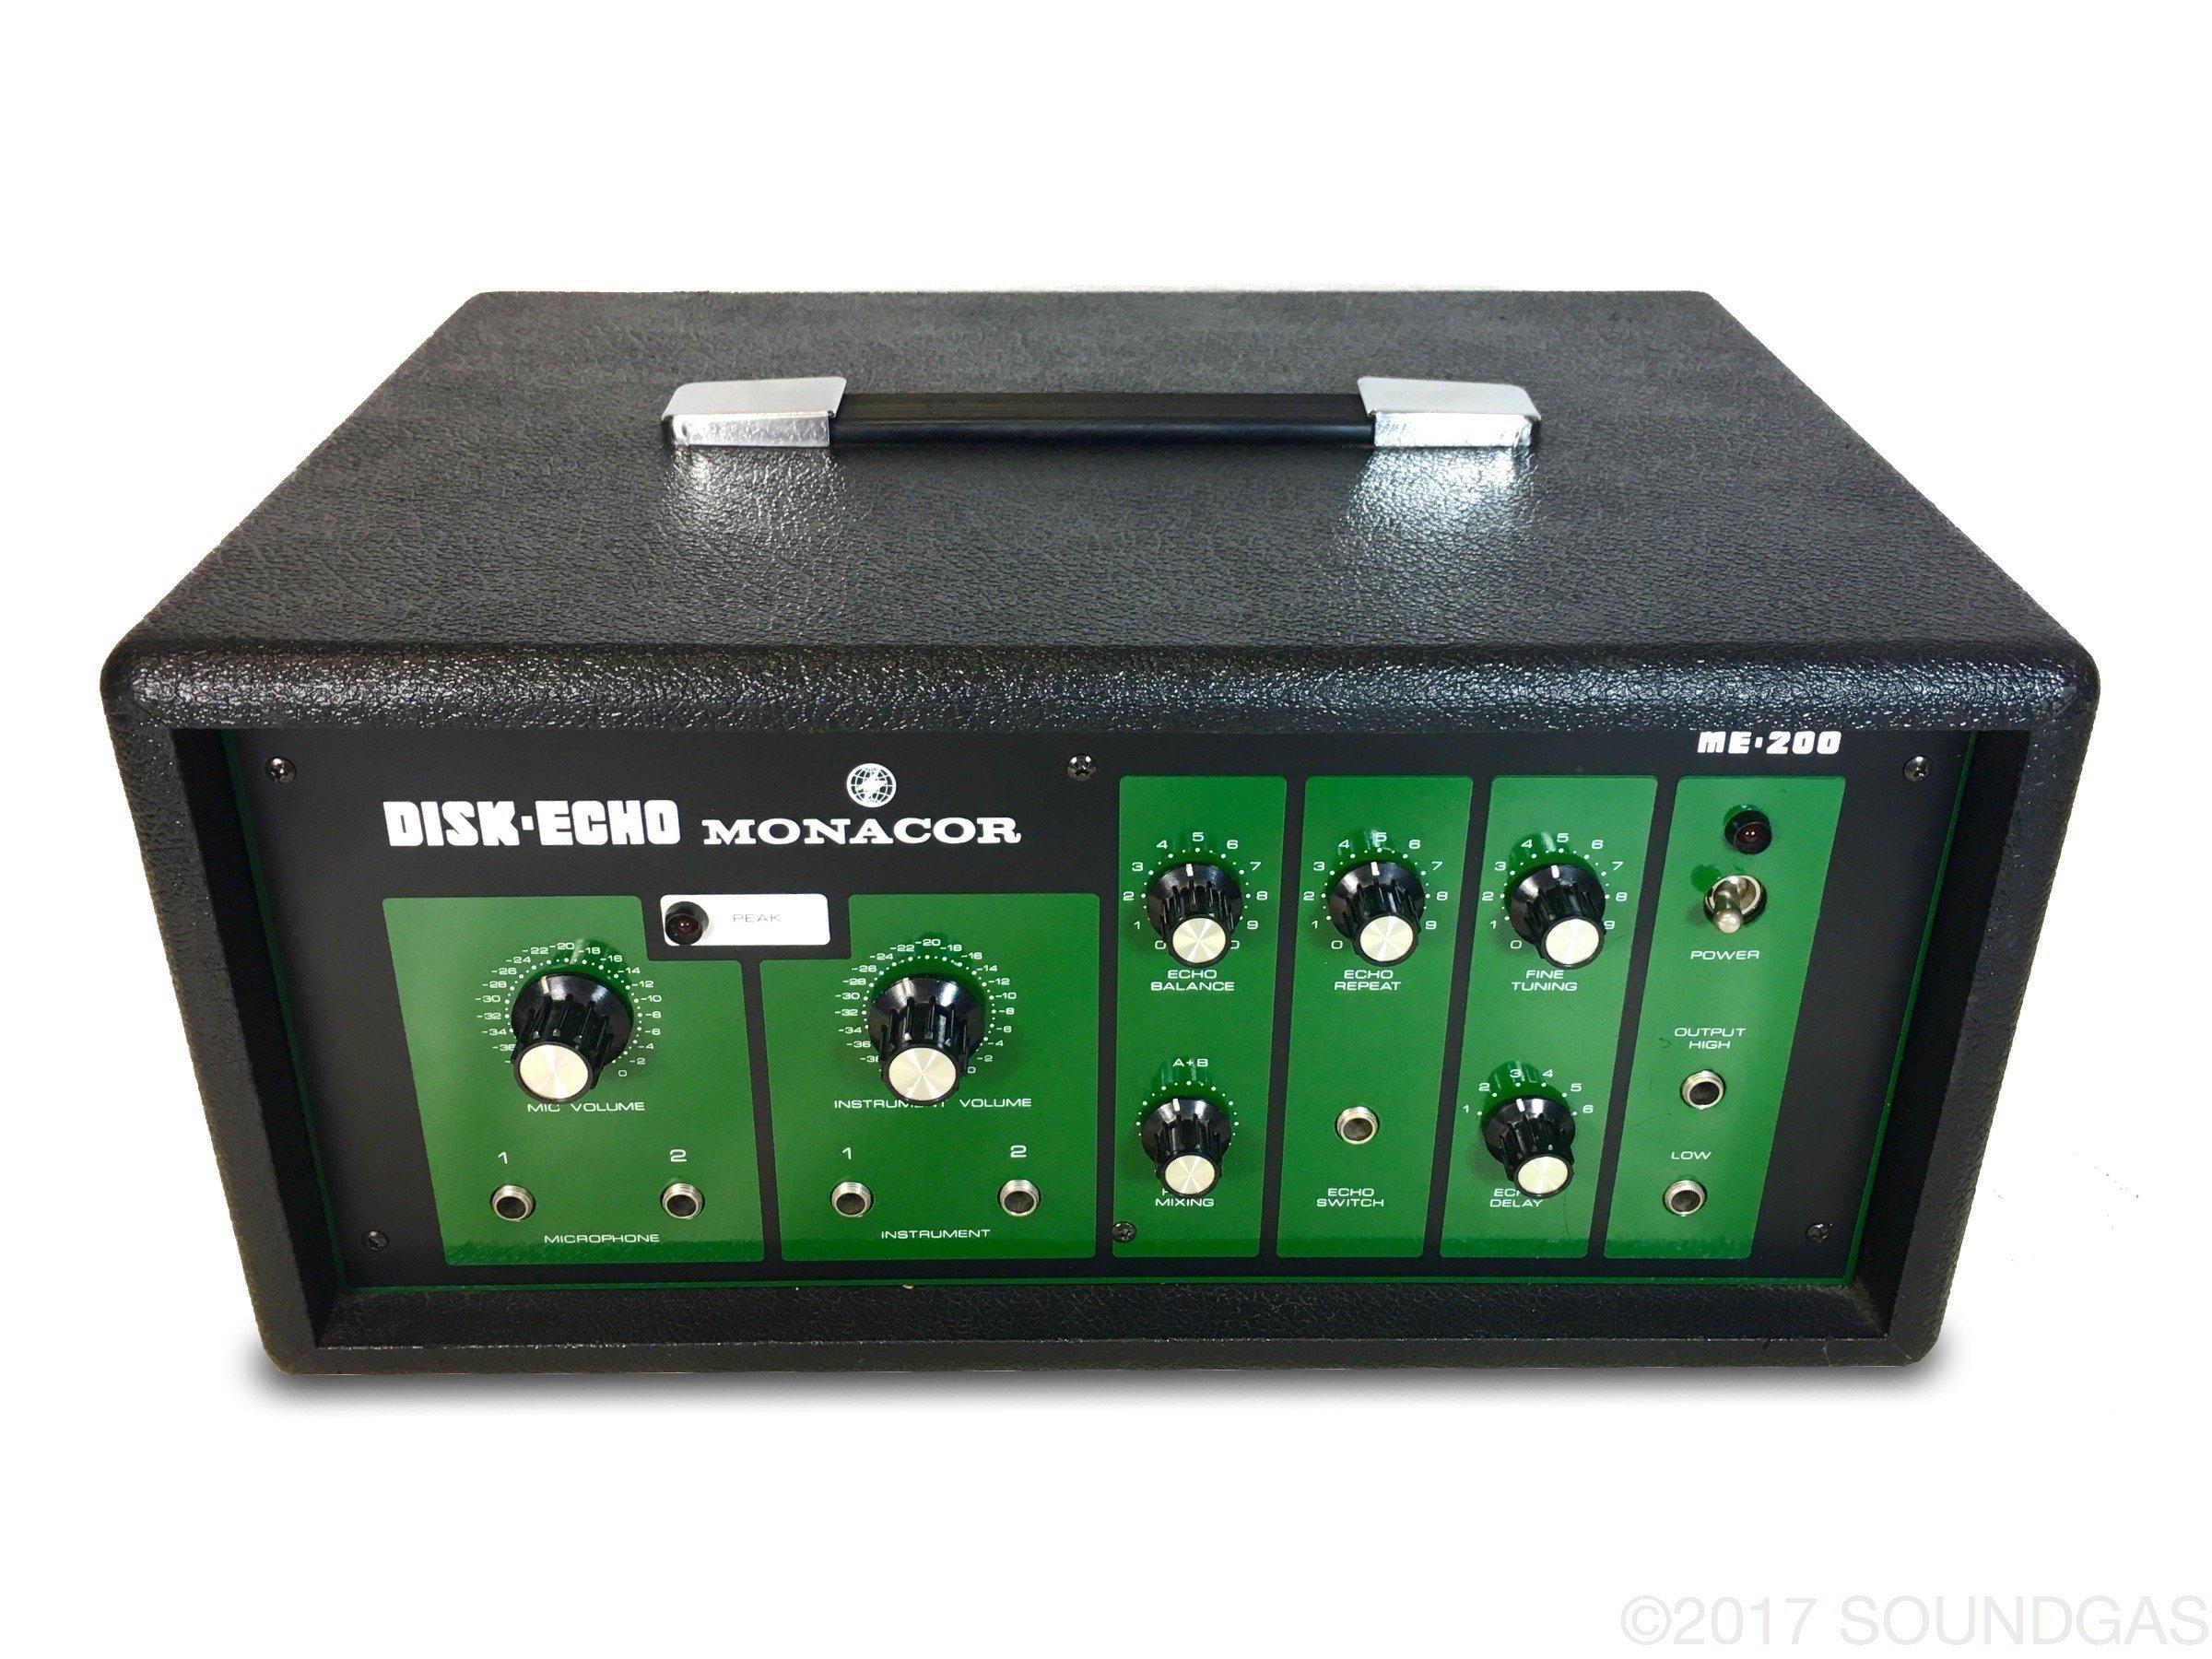 Monacor ME-200 Disk Echo